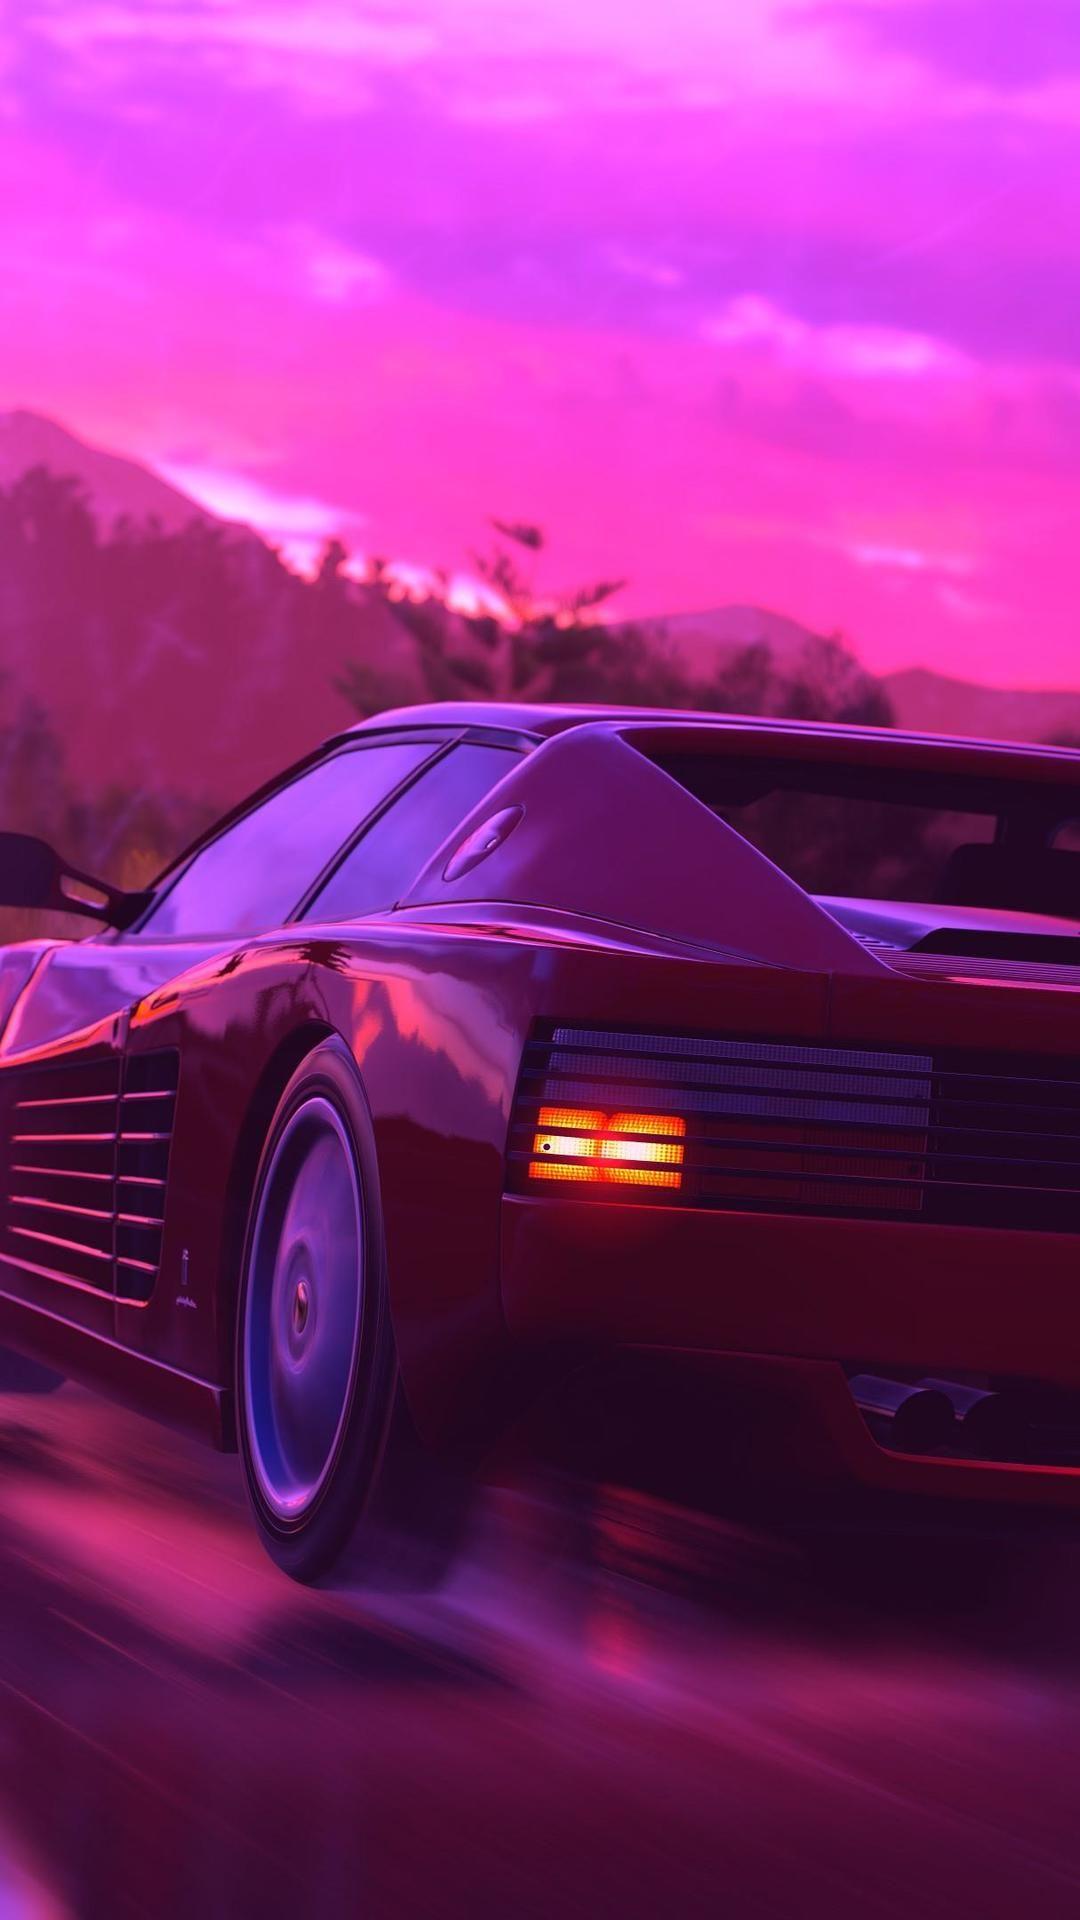 Ferrari Testarossa Retrowave Pink 4k Pc Wallpaper Retro 640x1138 Download Hd Wallpaper Wallpapertip